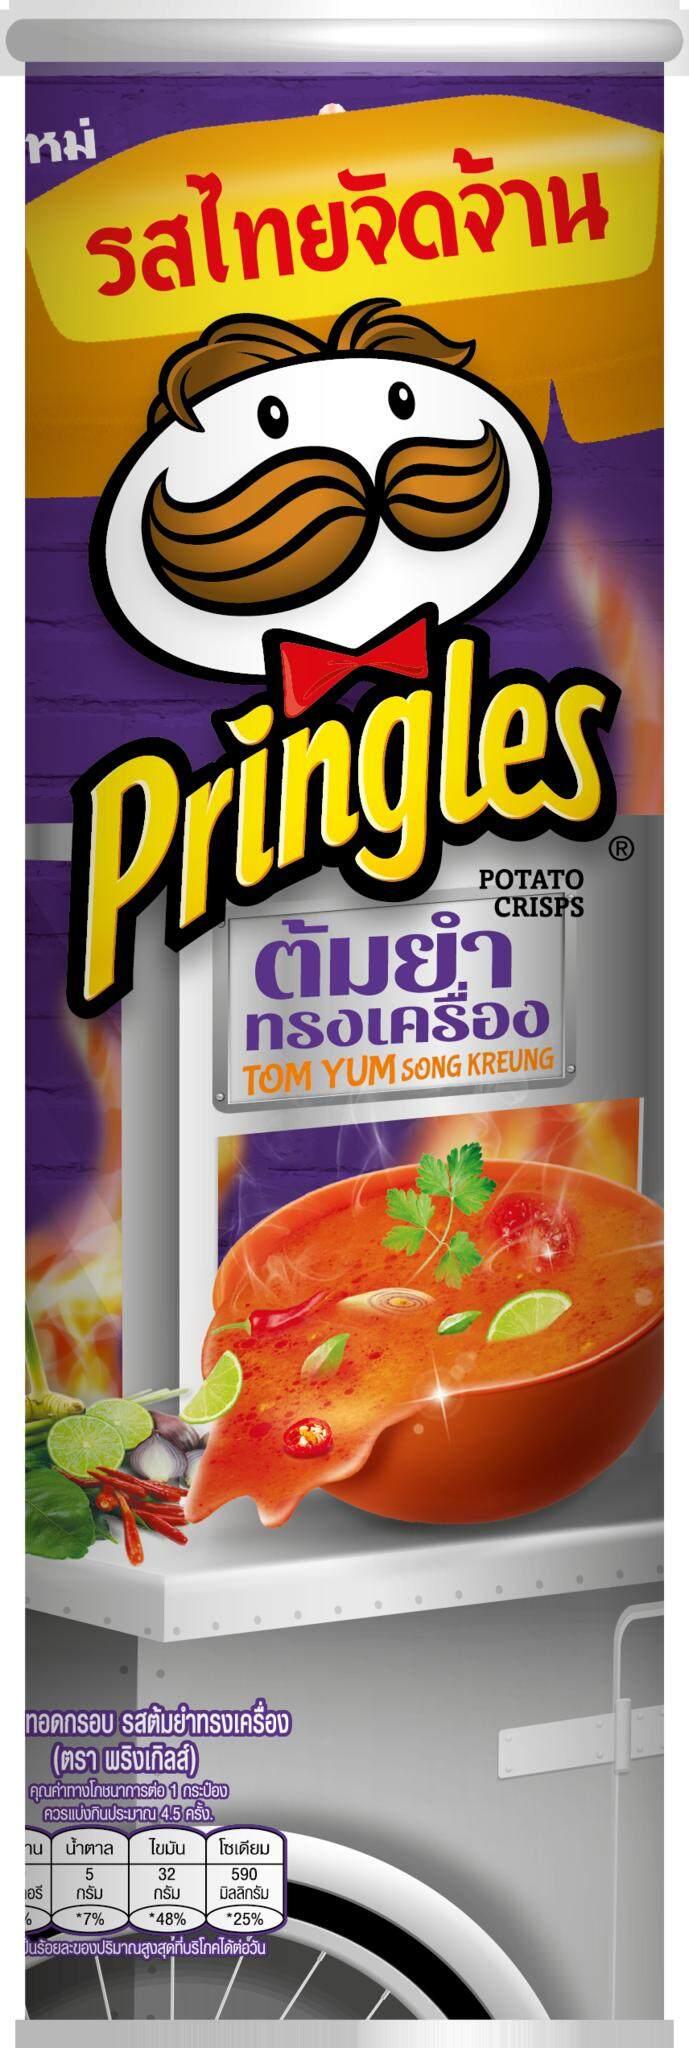 Pringles Potato Chips Tom Yam 107g (New Flavor)